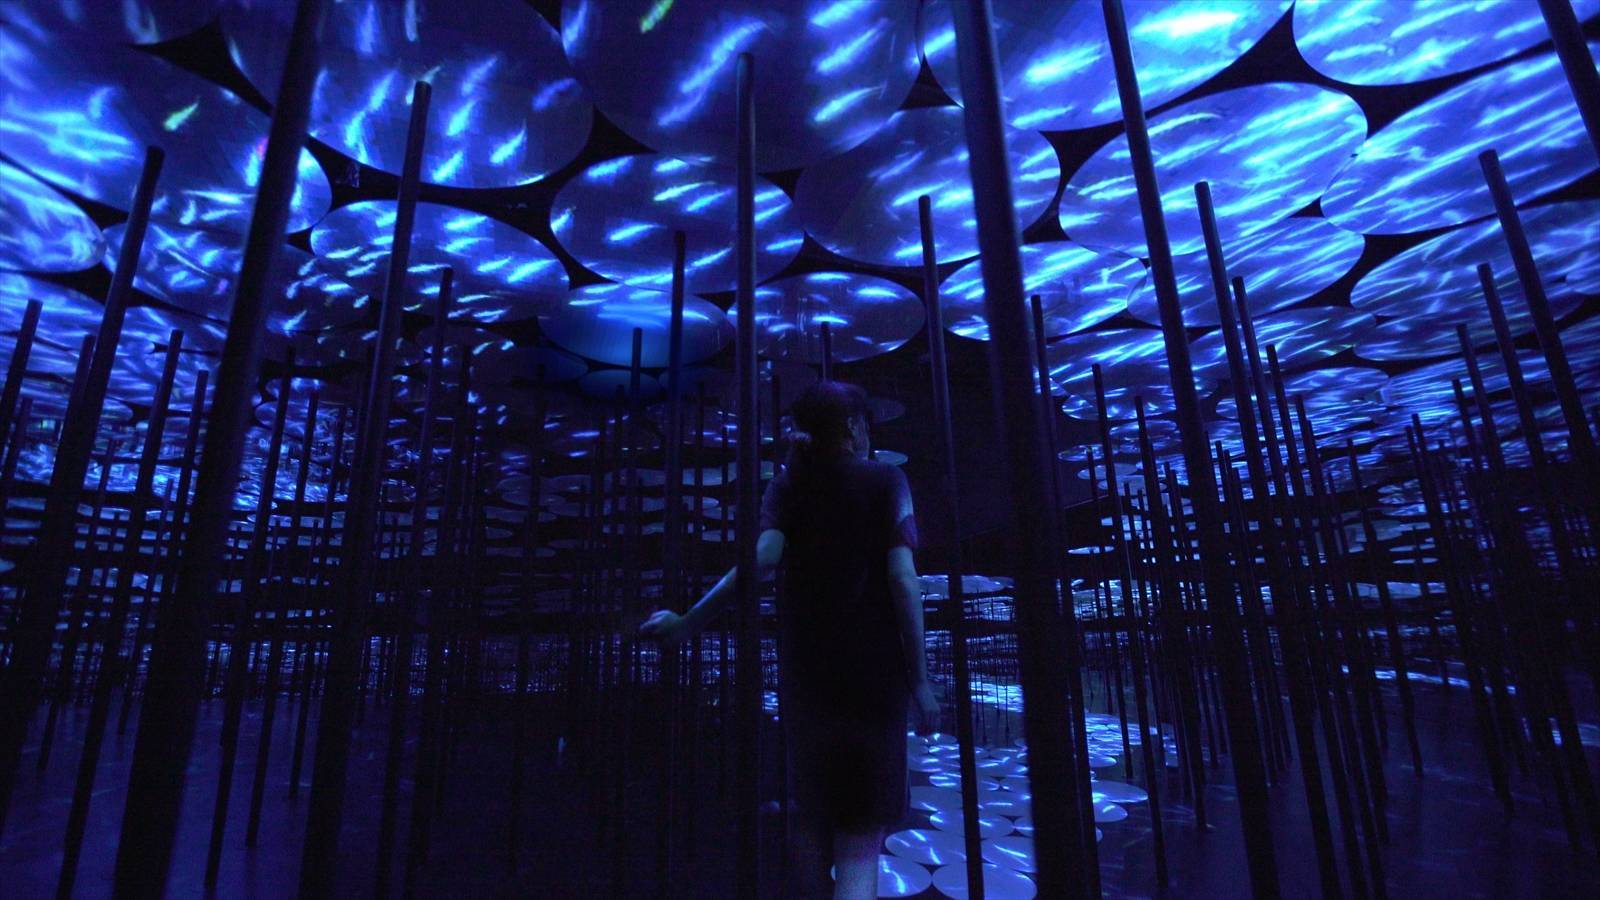 Spellbinding Moro Digital Art Museum In Tokyo